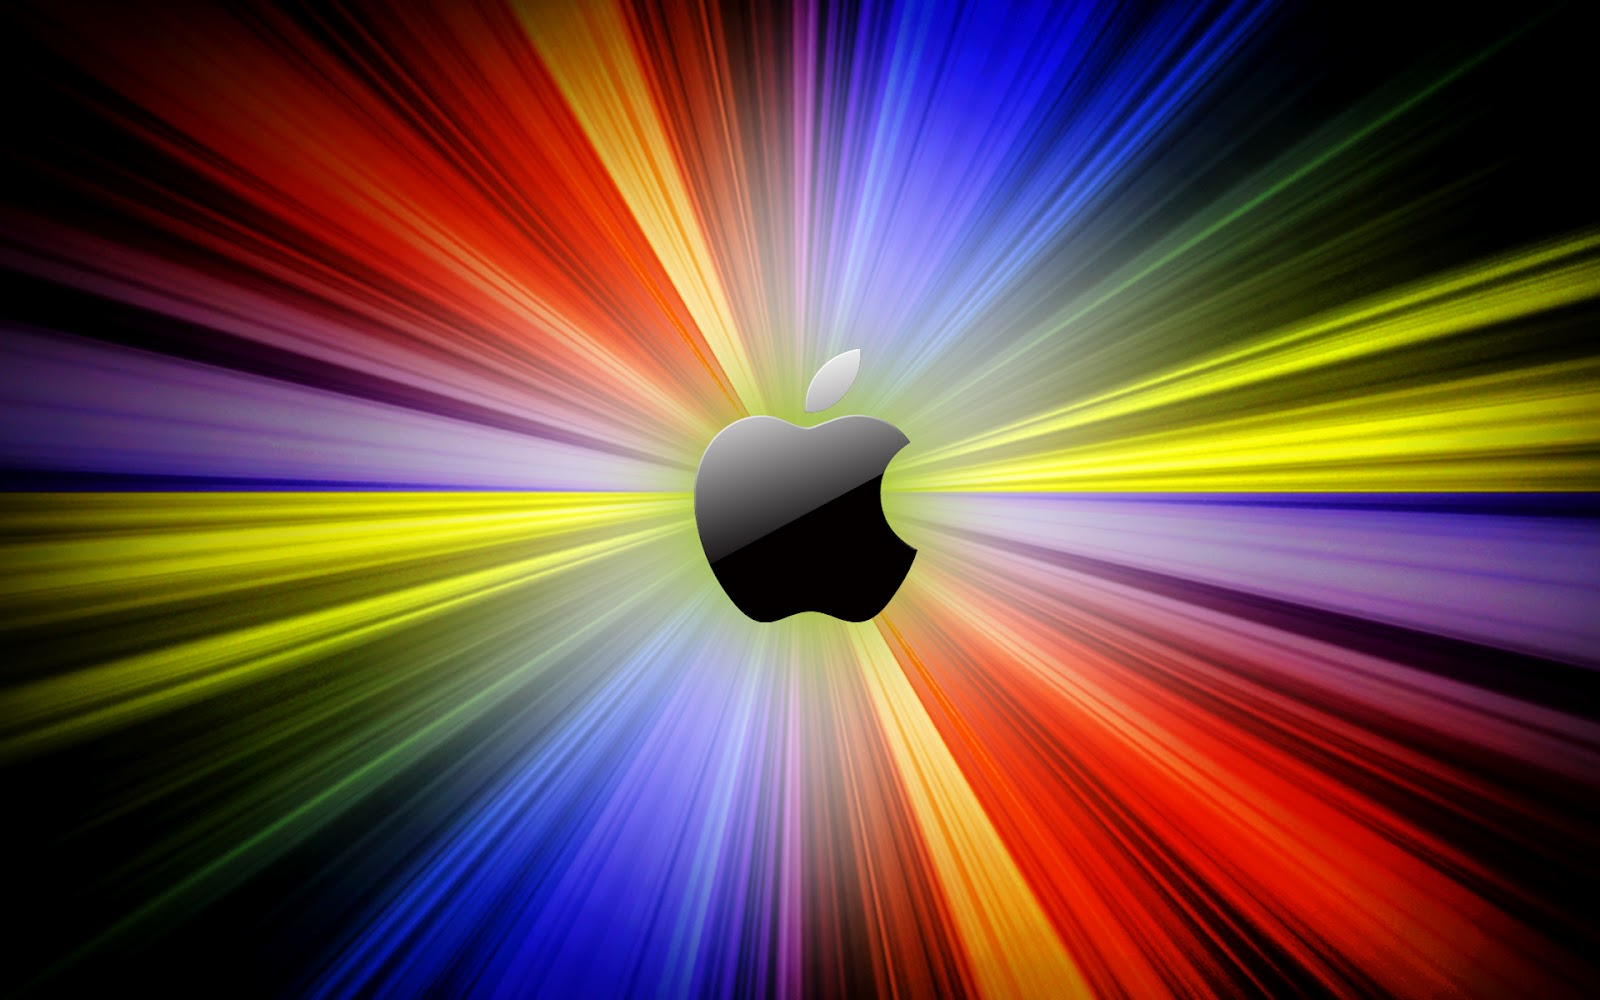 Wallpapers HD: Apple - Mac (30) Wallpapers (Fondo de ...  Wallpapers HD: ...